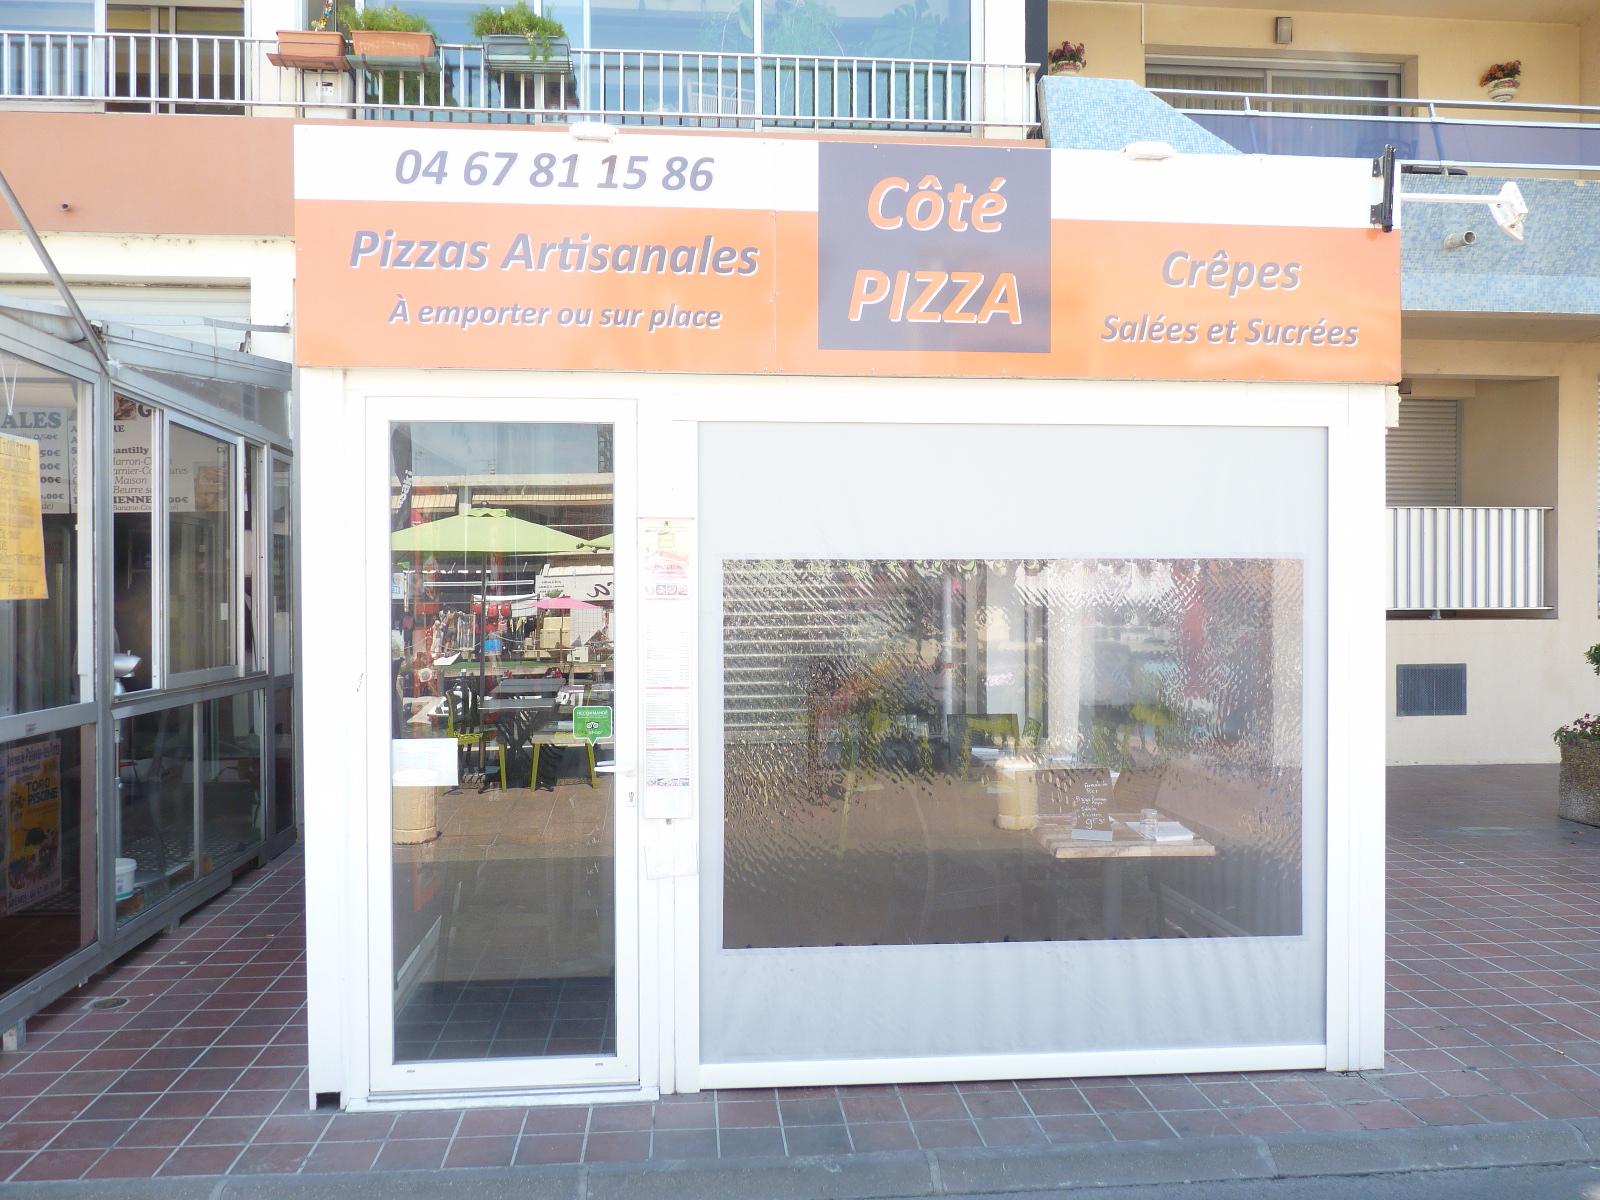 Pizzeria, Crêperie, Petite restauration